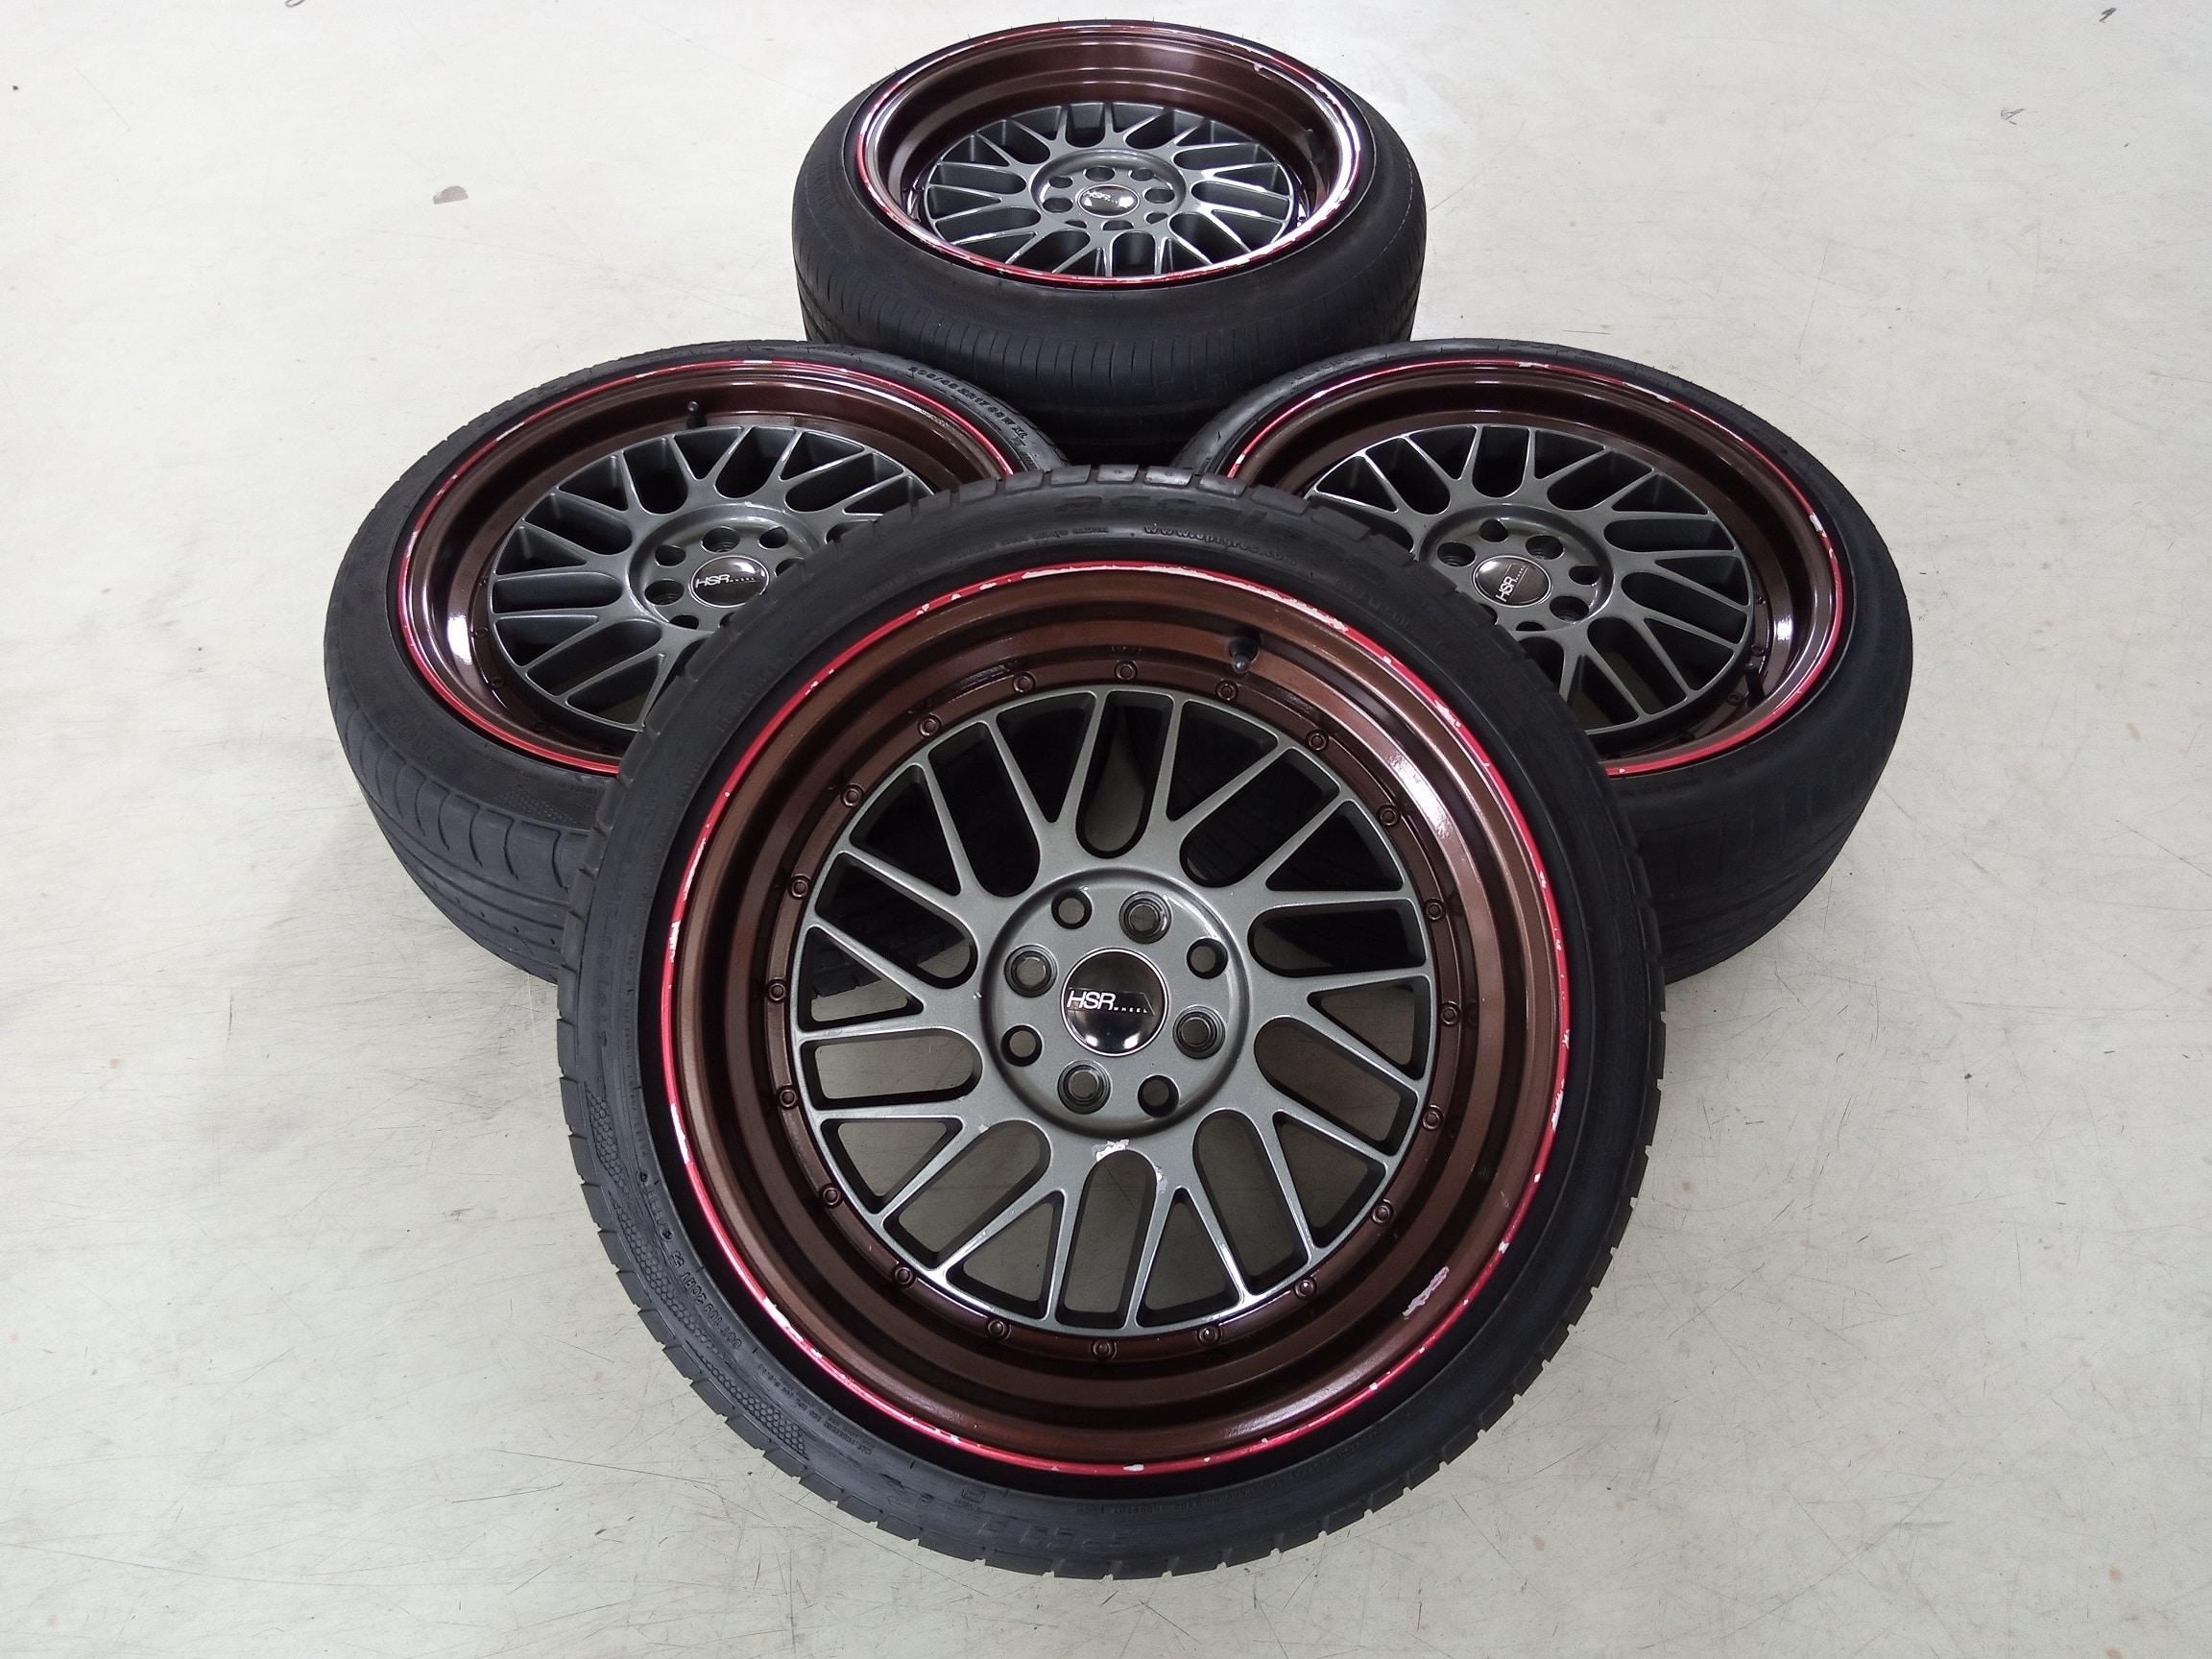 Velg Bekas Racing HSR Type Paddock Ring 17 Buat Mazda,Yaris,Livina,Soluna